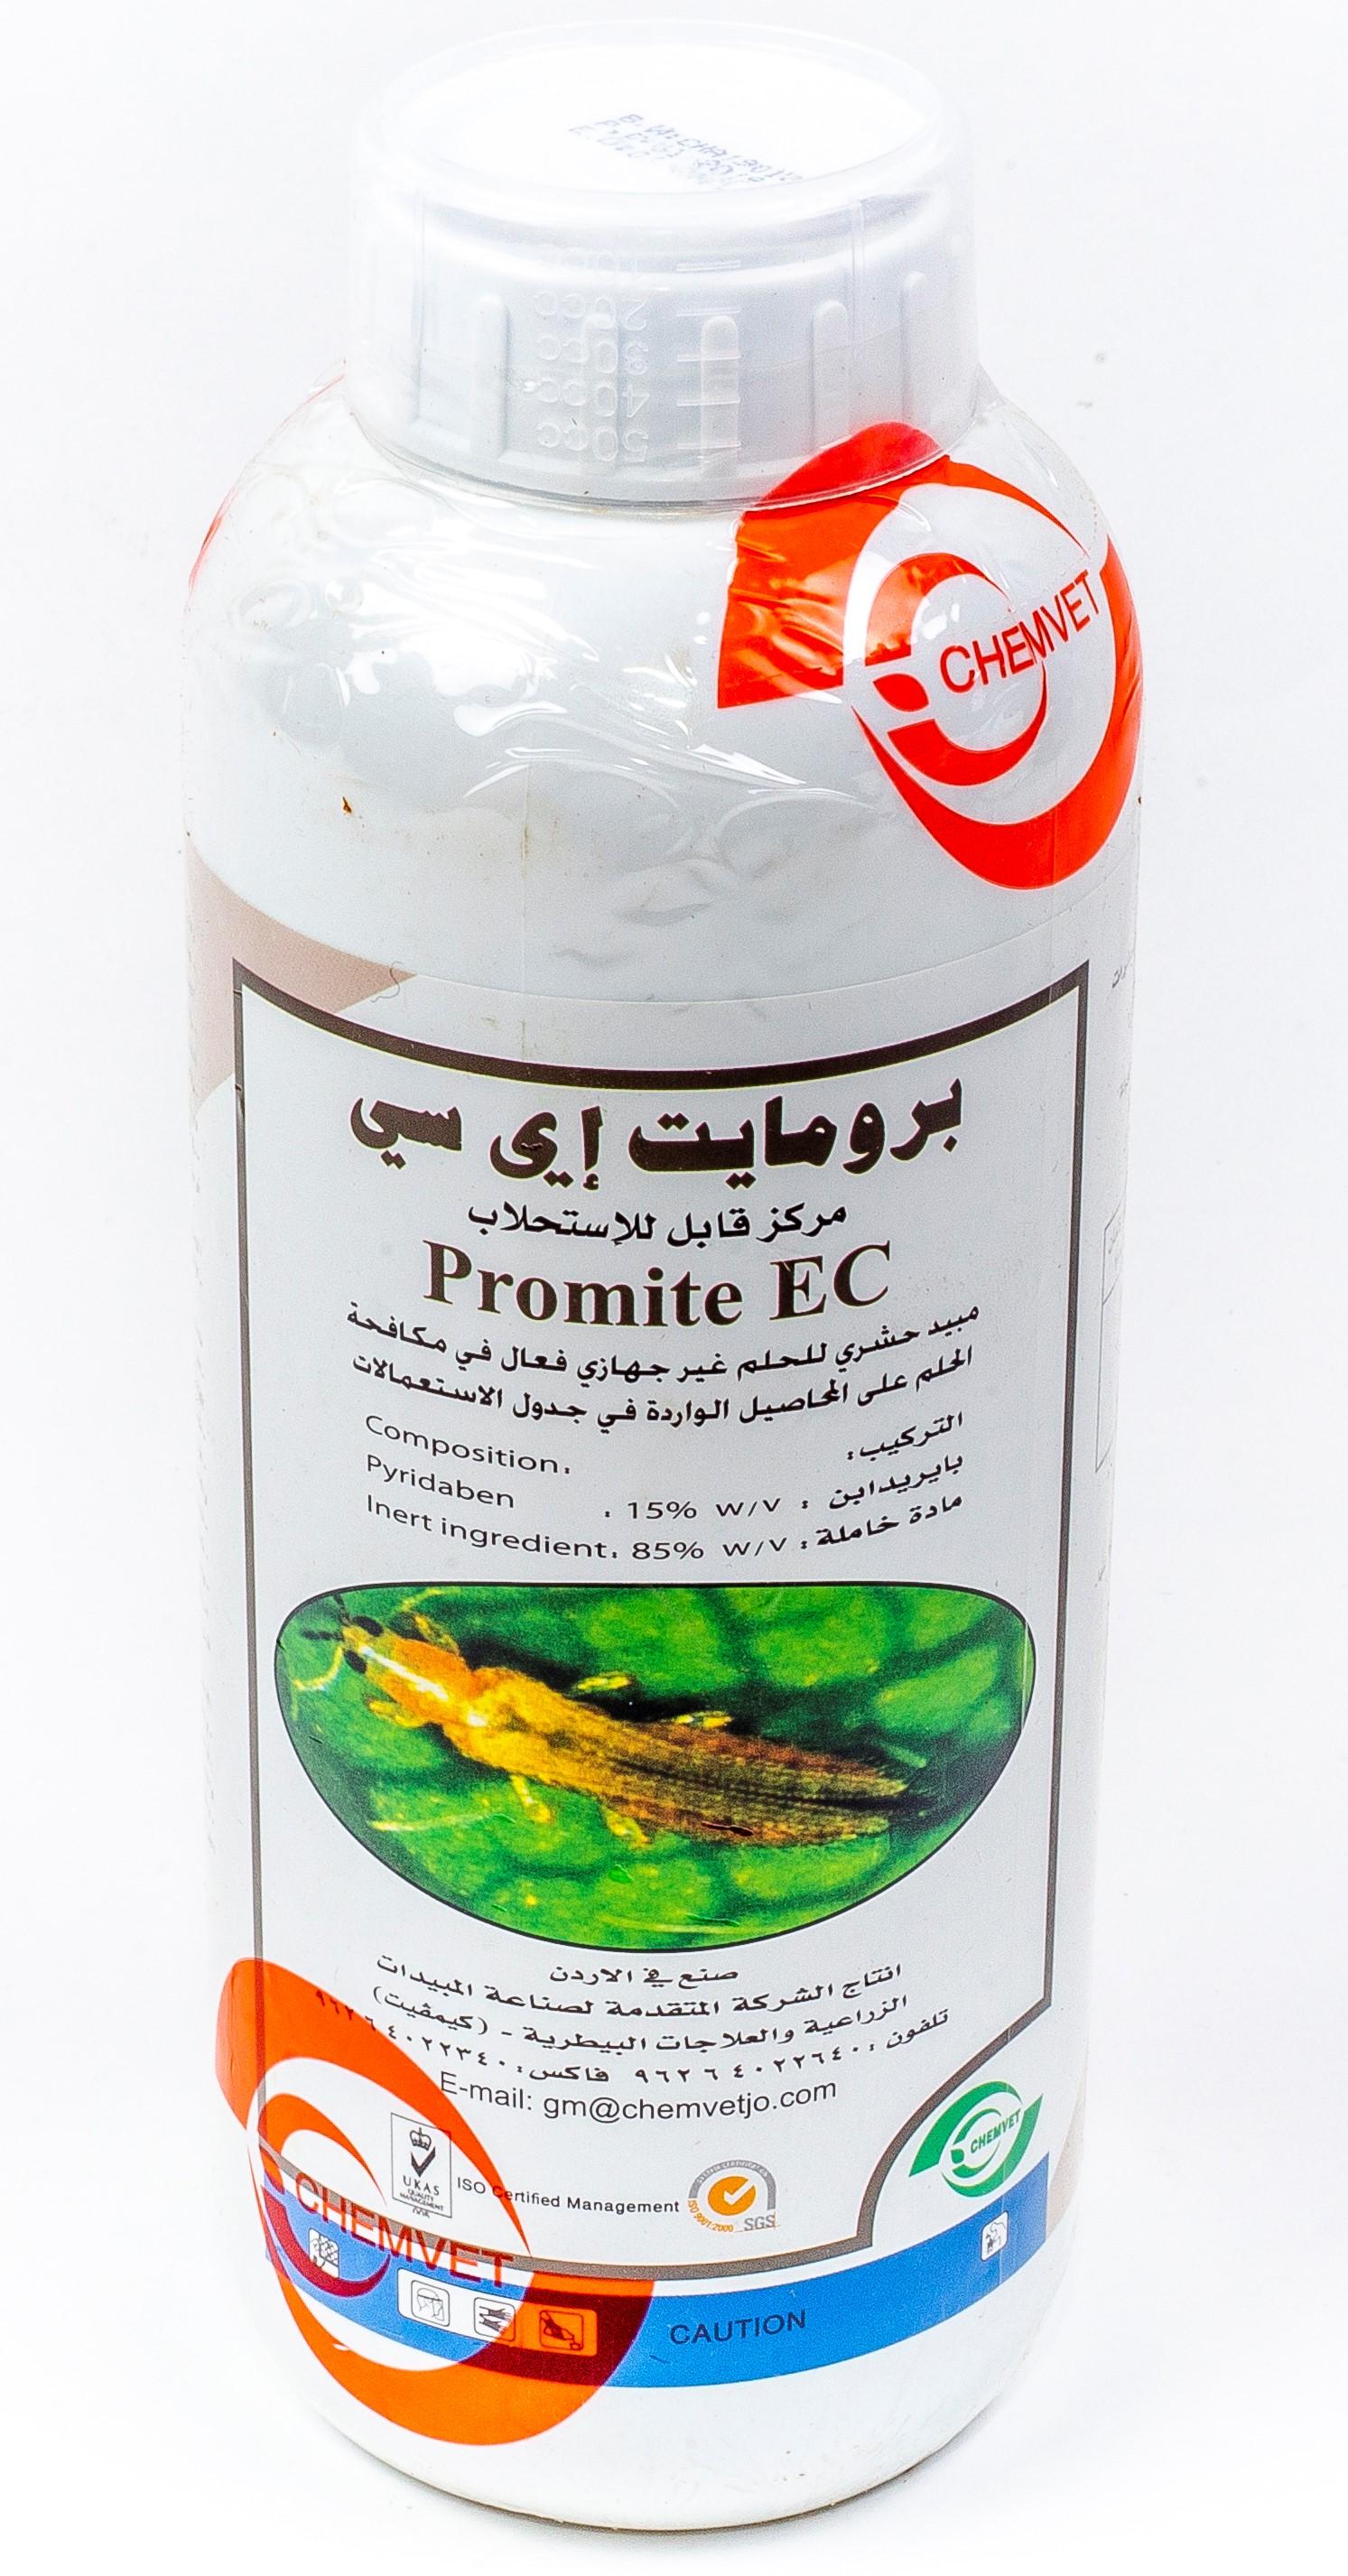 Promite EC